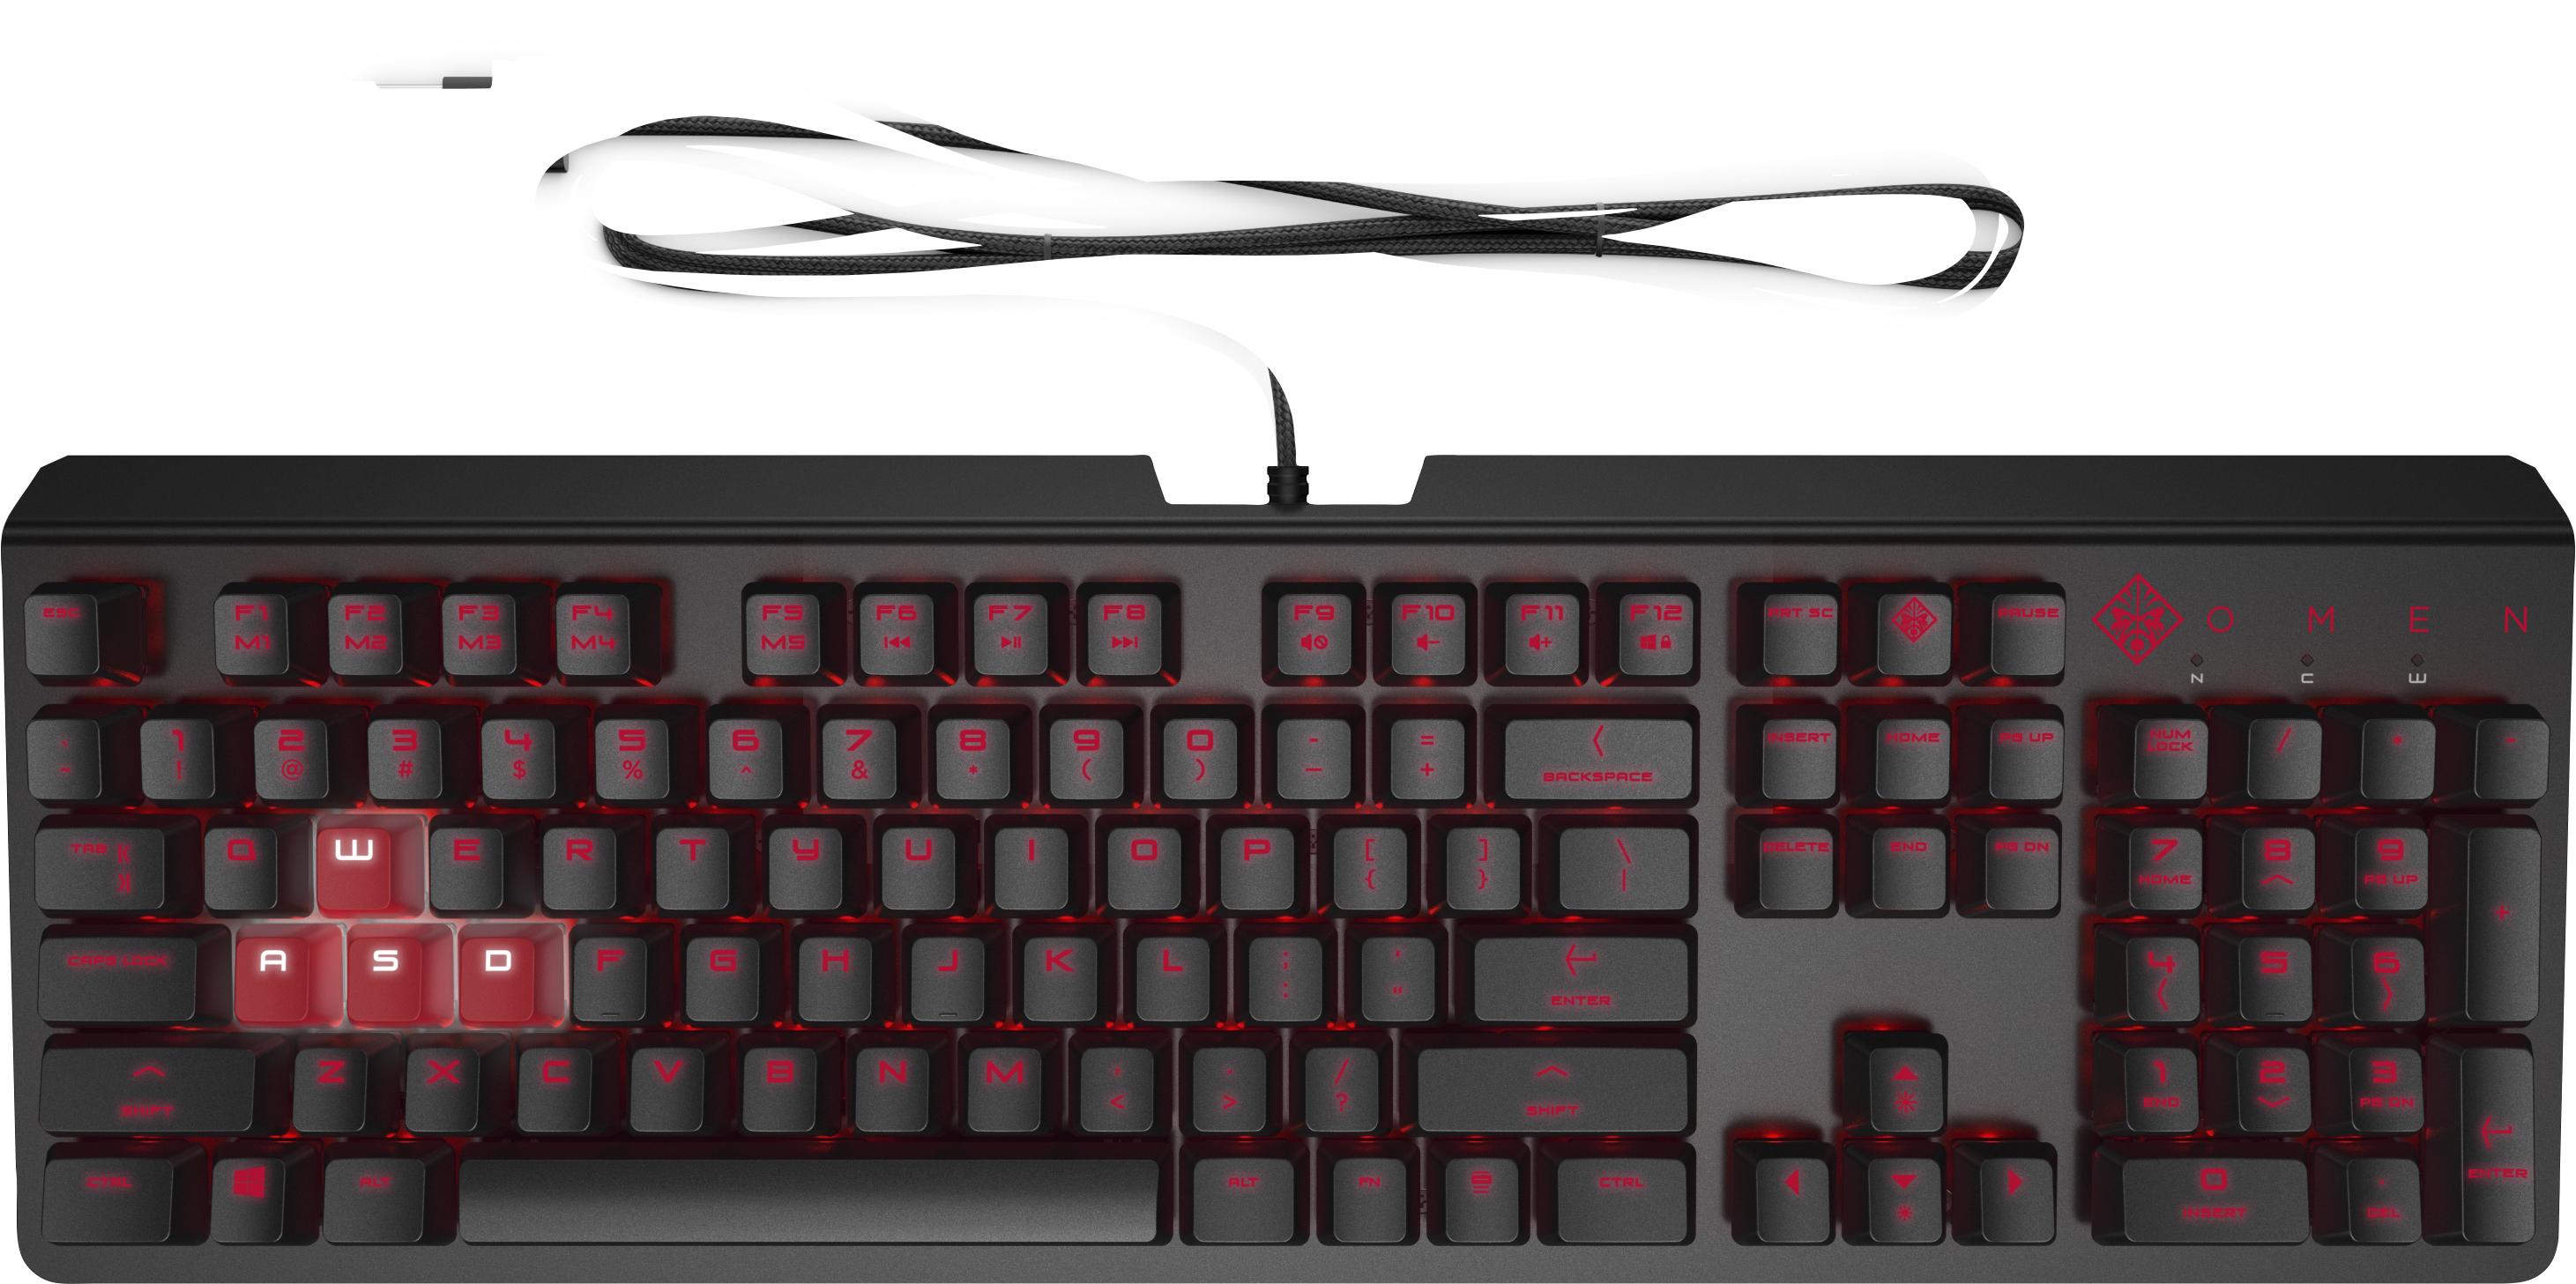 Omen By HP Encoder Keyboard Red/Cherry